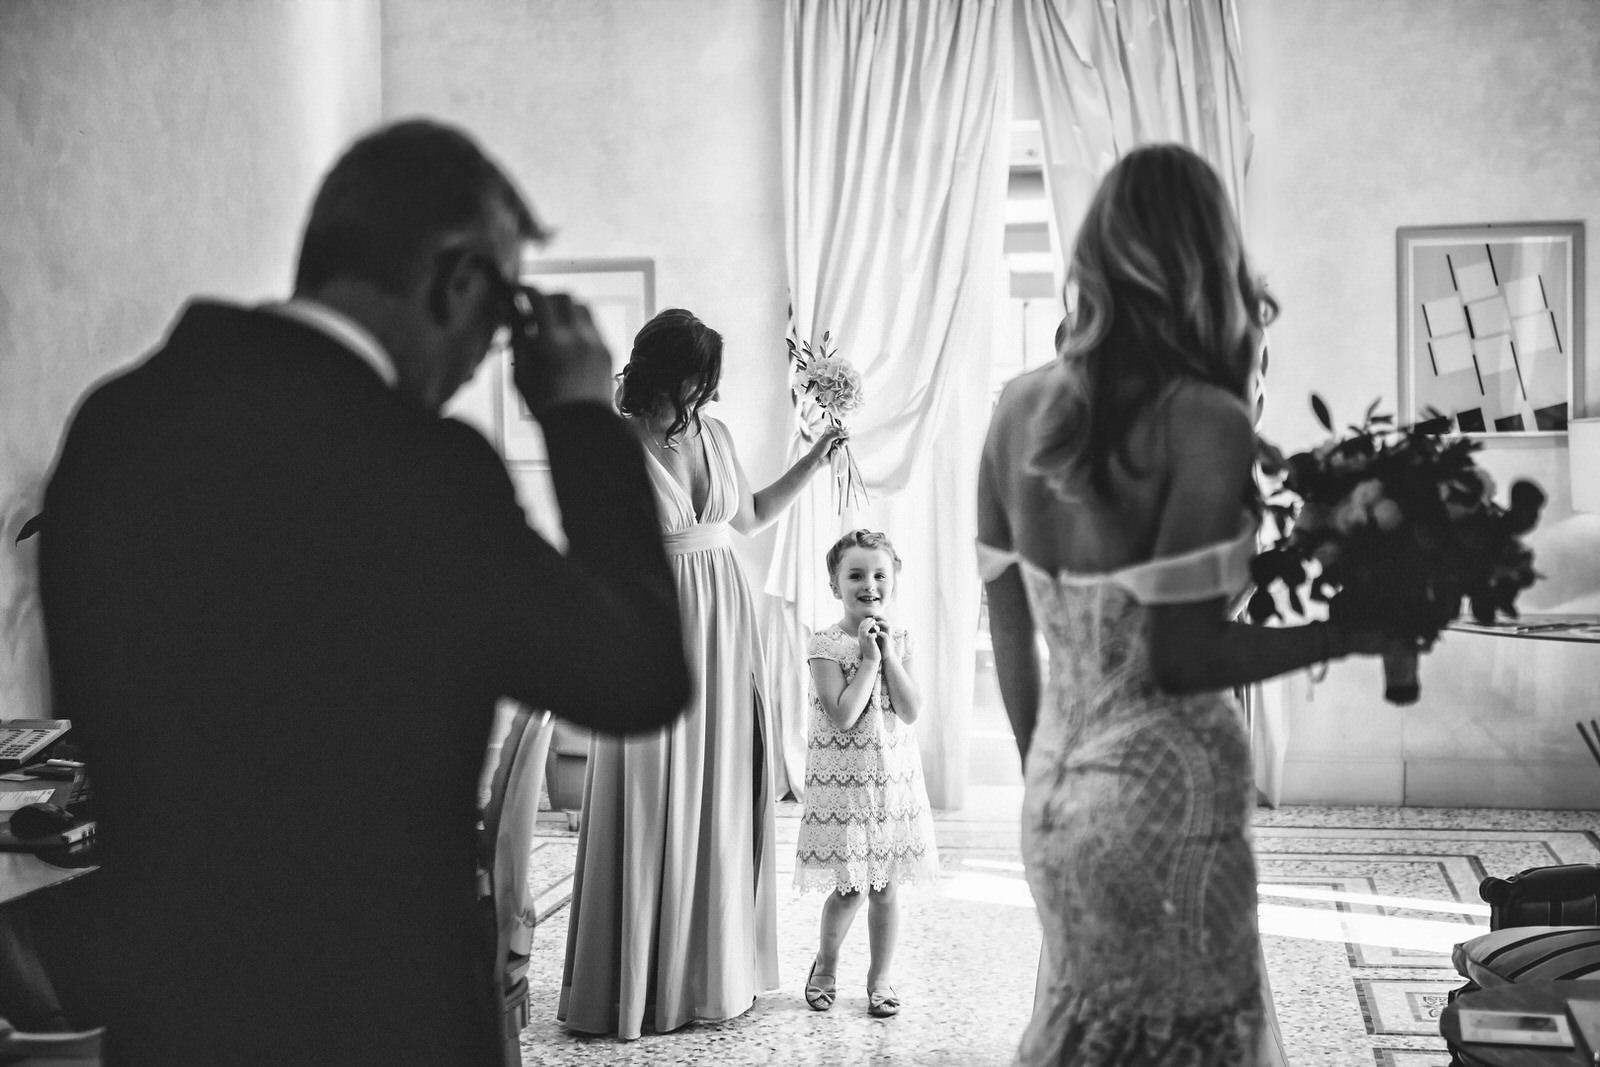 wedding photographer in italy-venice-tuscany-florence-amalfi coast-como lake-villa del balbianello-siena-amalfi-ravello-belmond-villa cimbrone48